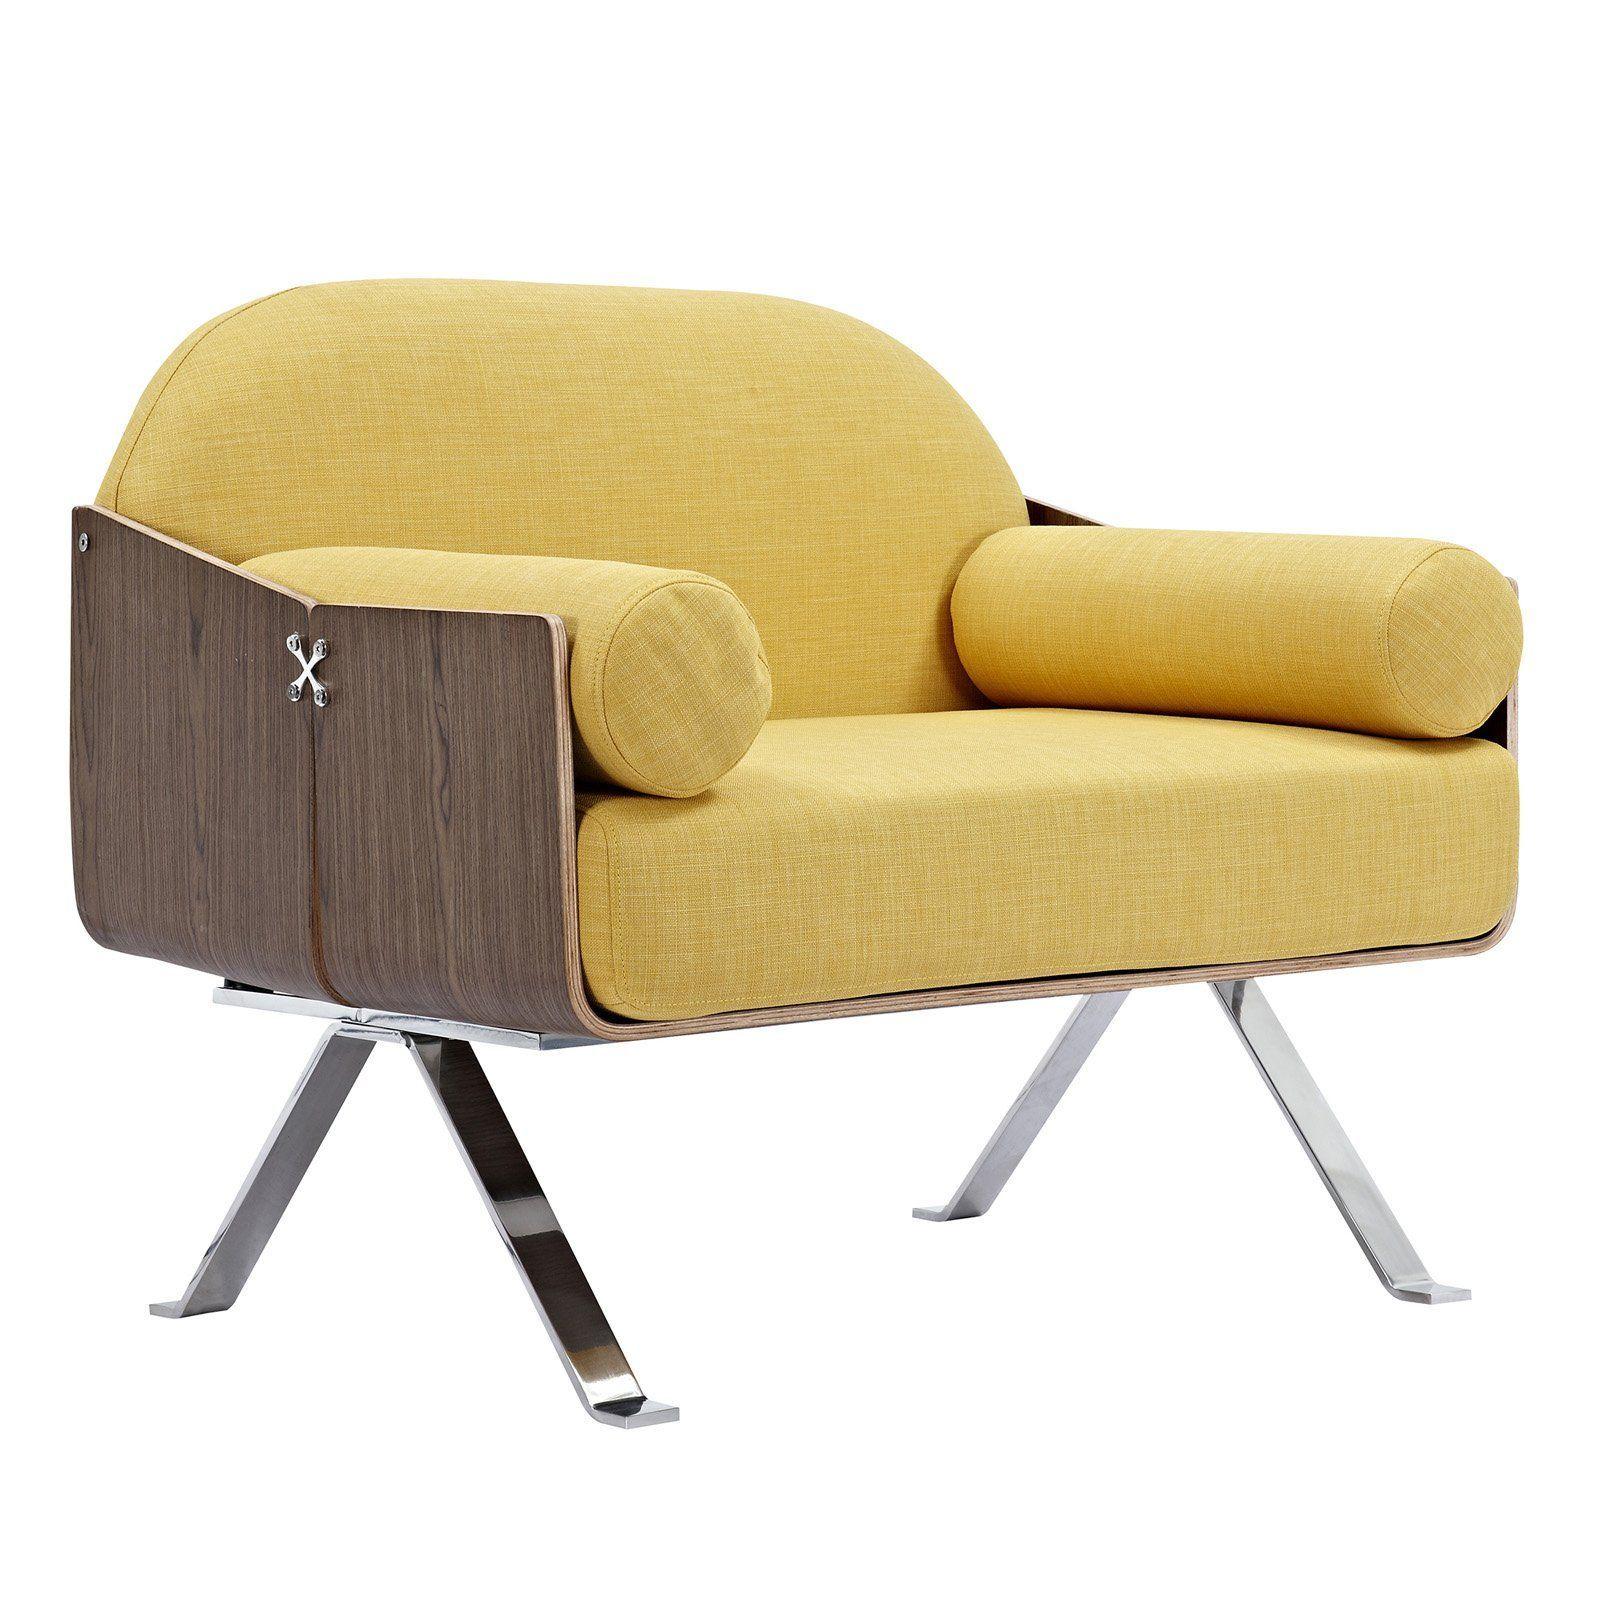 Papaya Yellow Jorn Chair Chair Mid Century Modern Furniture